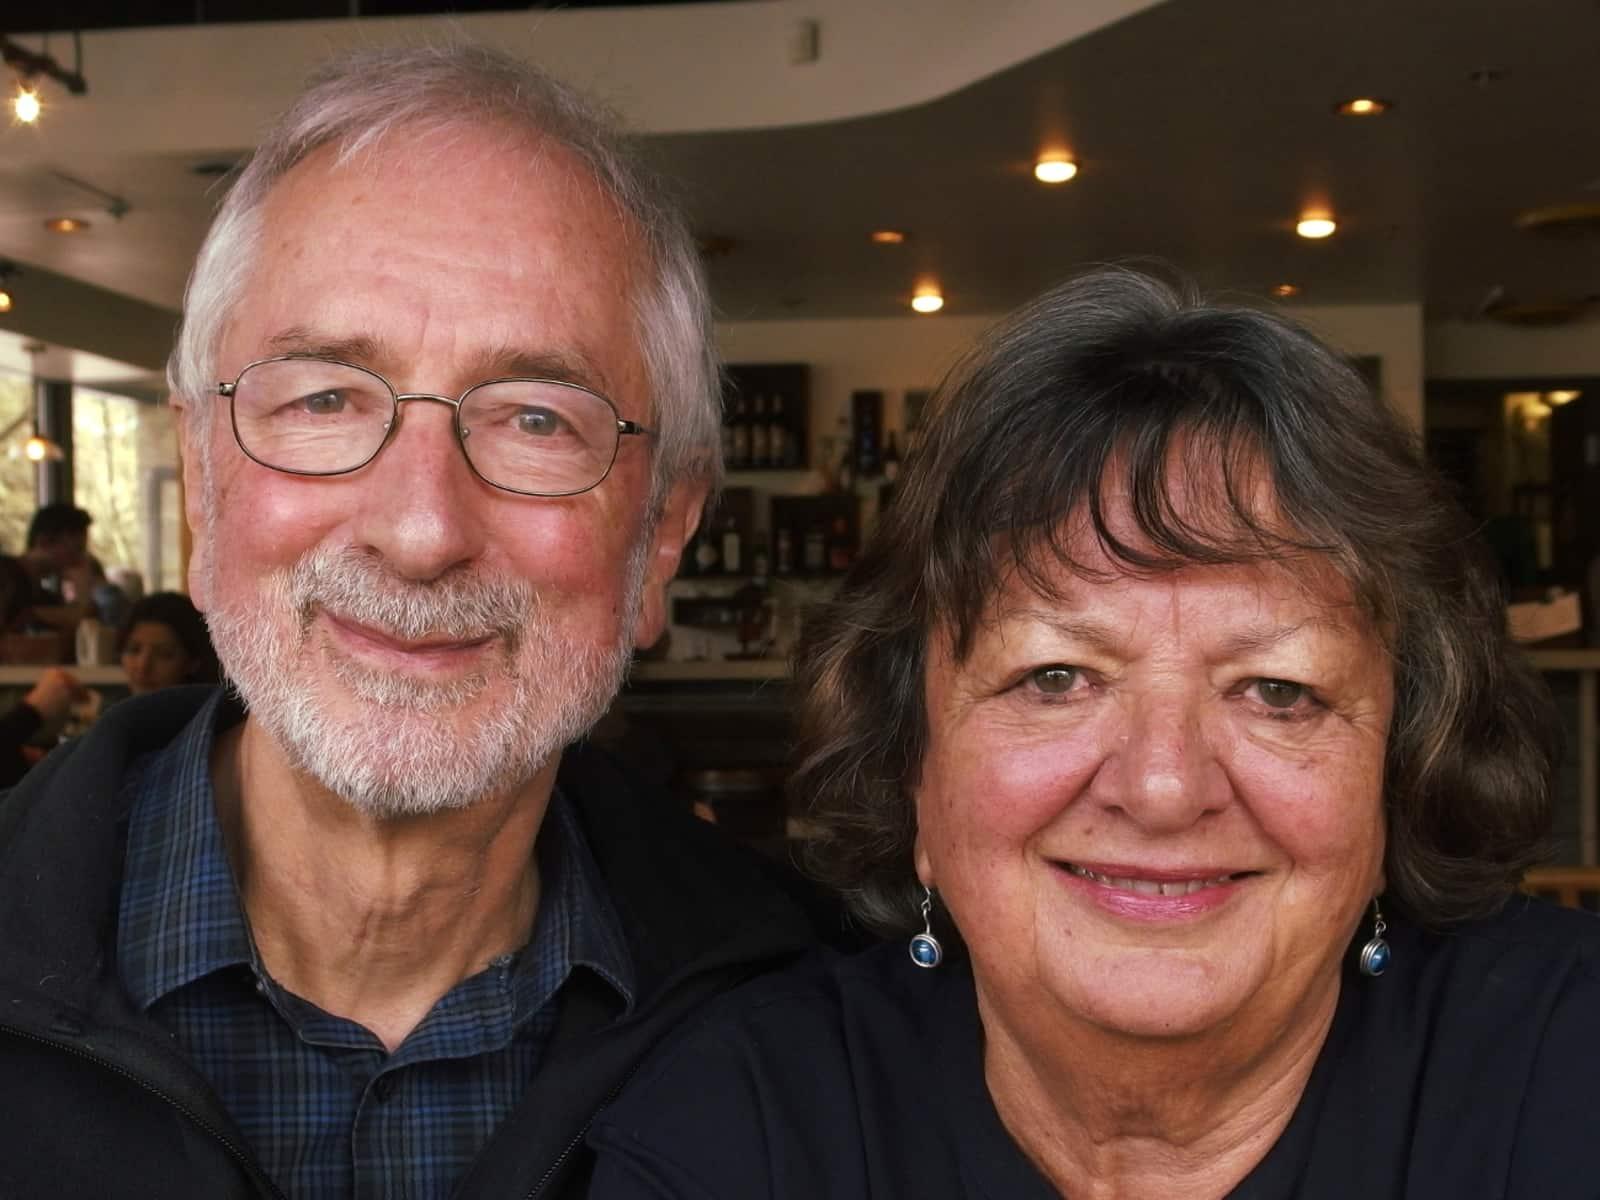 Martin & Rosalie from Montréal, Quebec, Canada